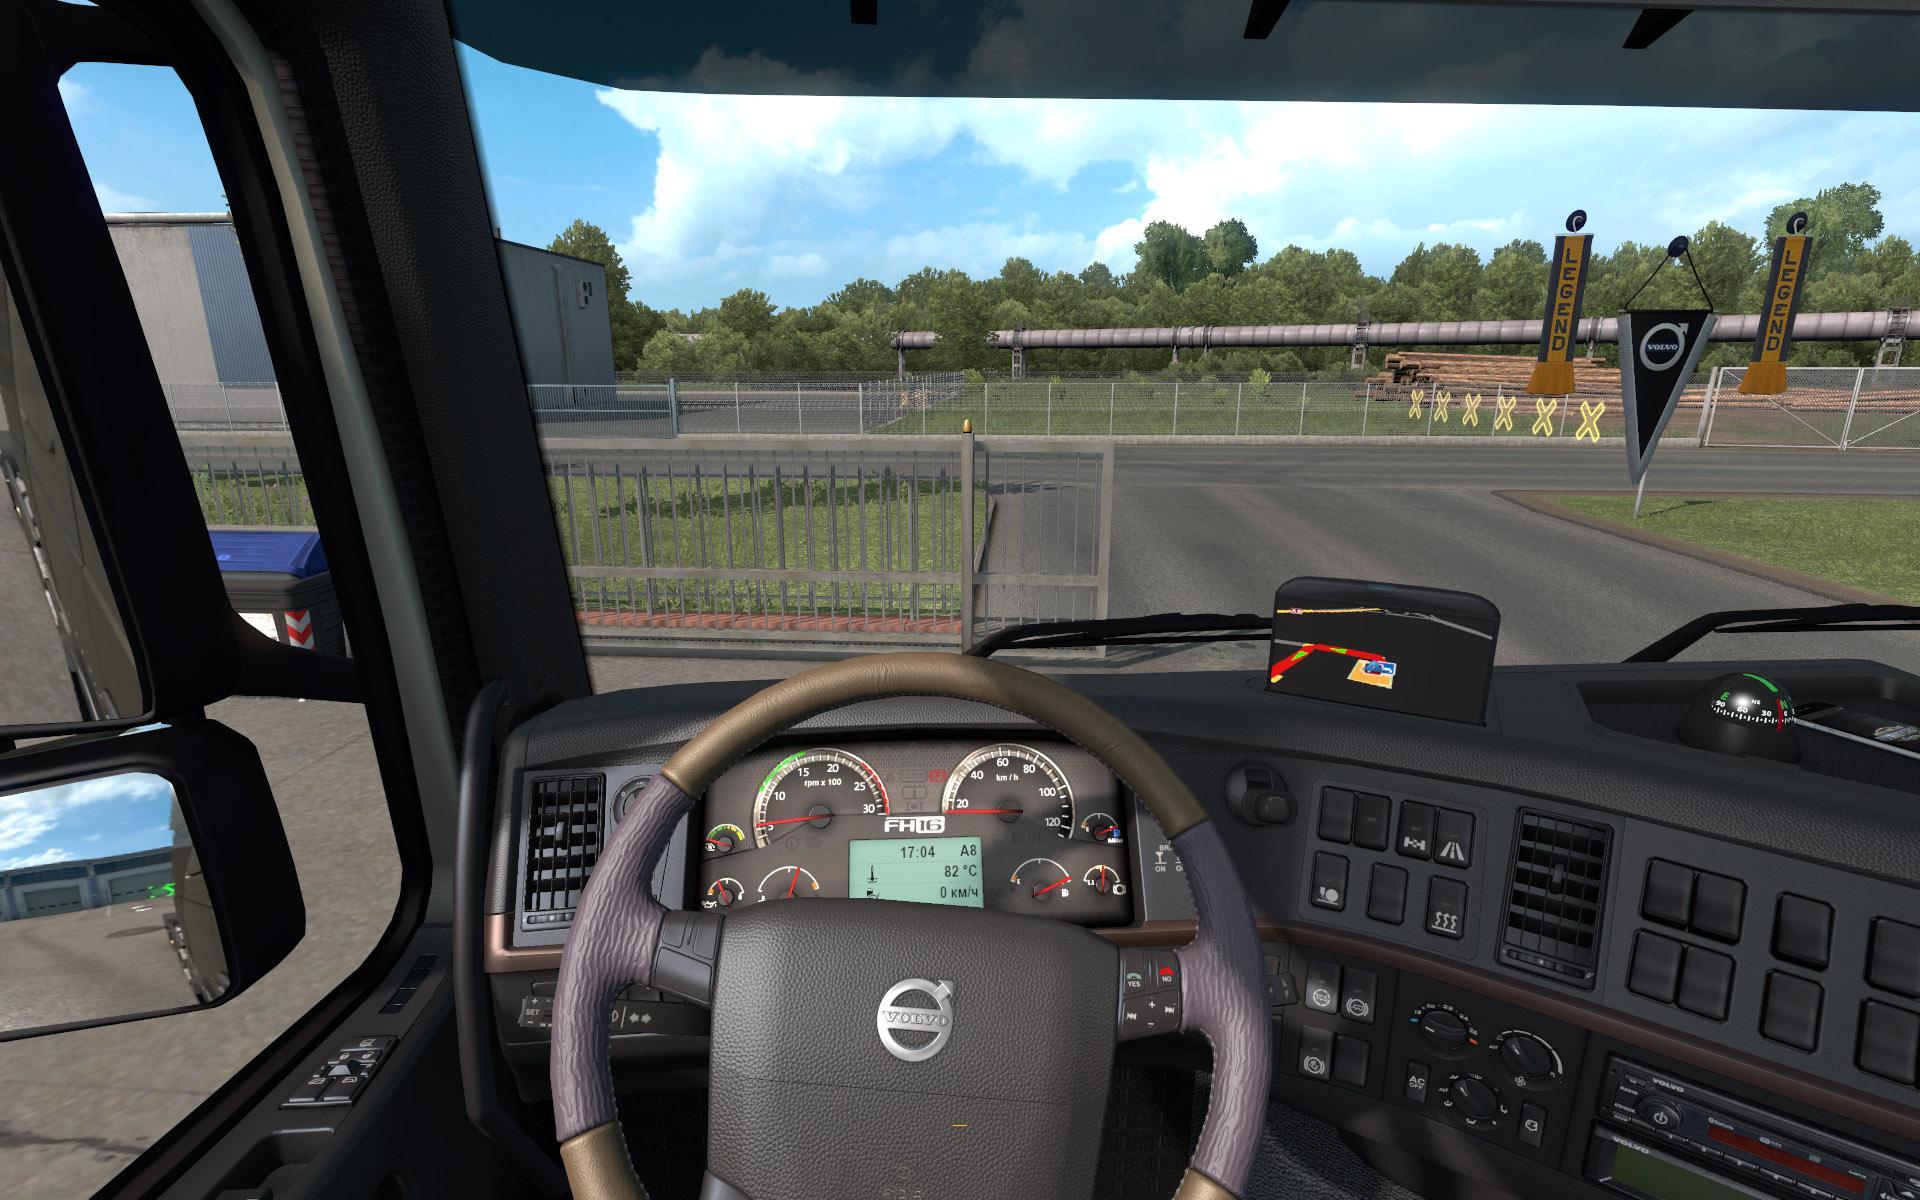 ETS2 - Volvo FH 2009 interior V1.3 (1.36.x)